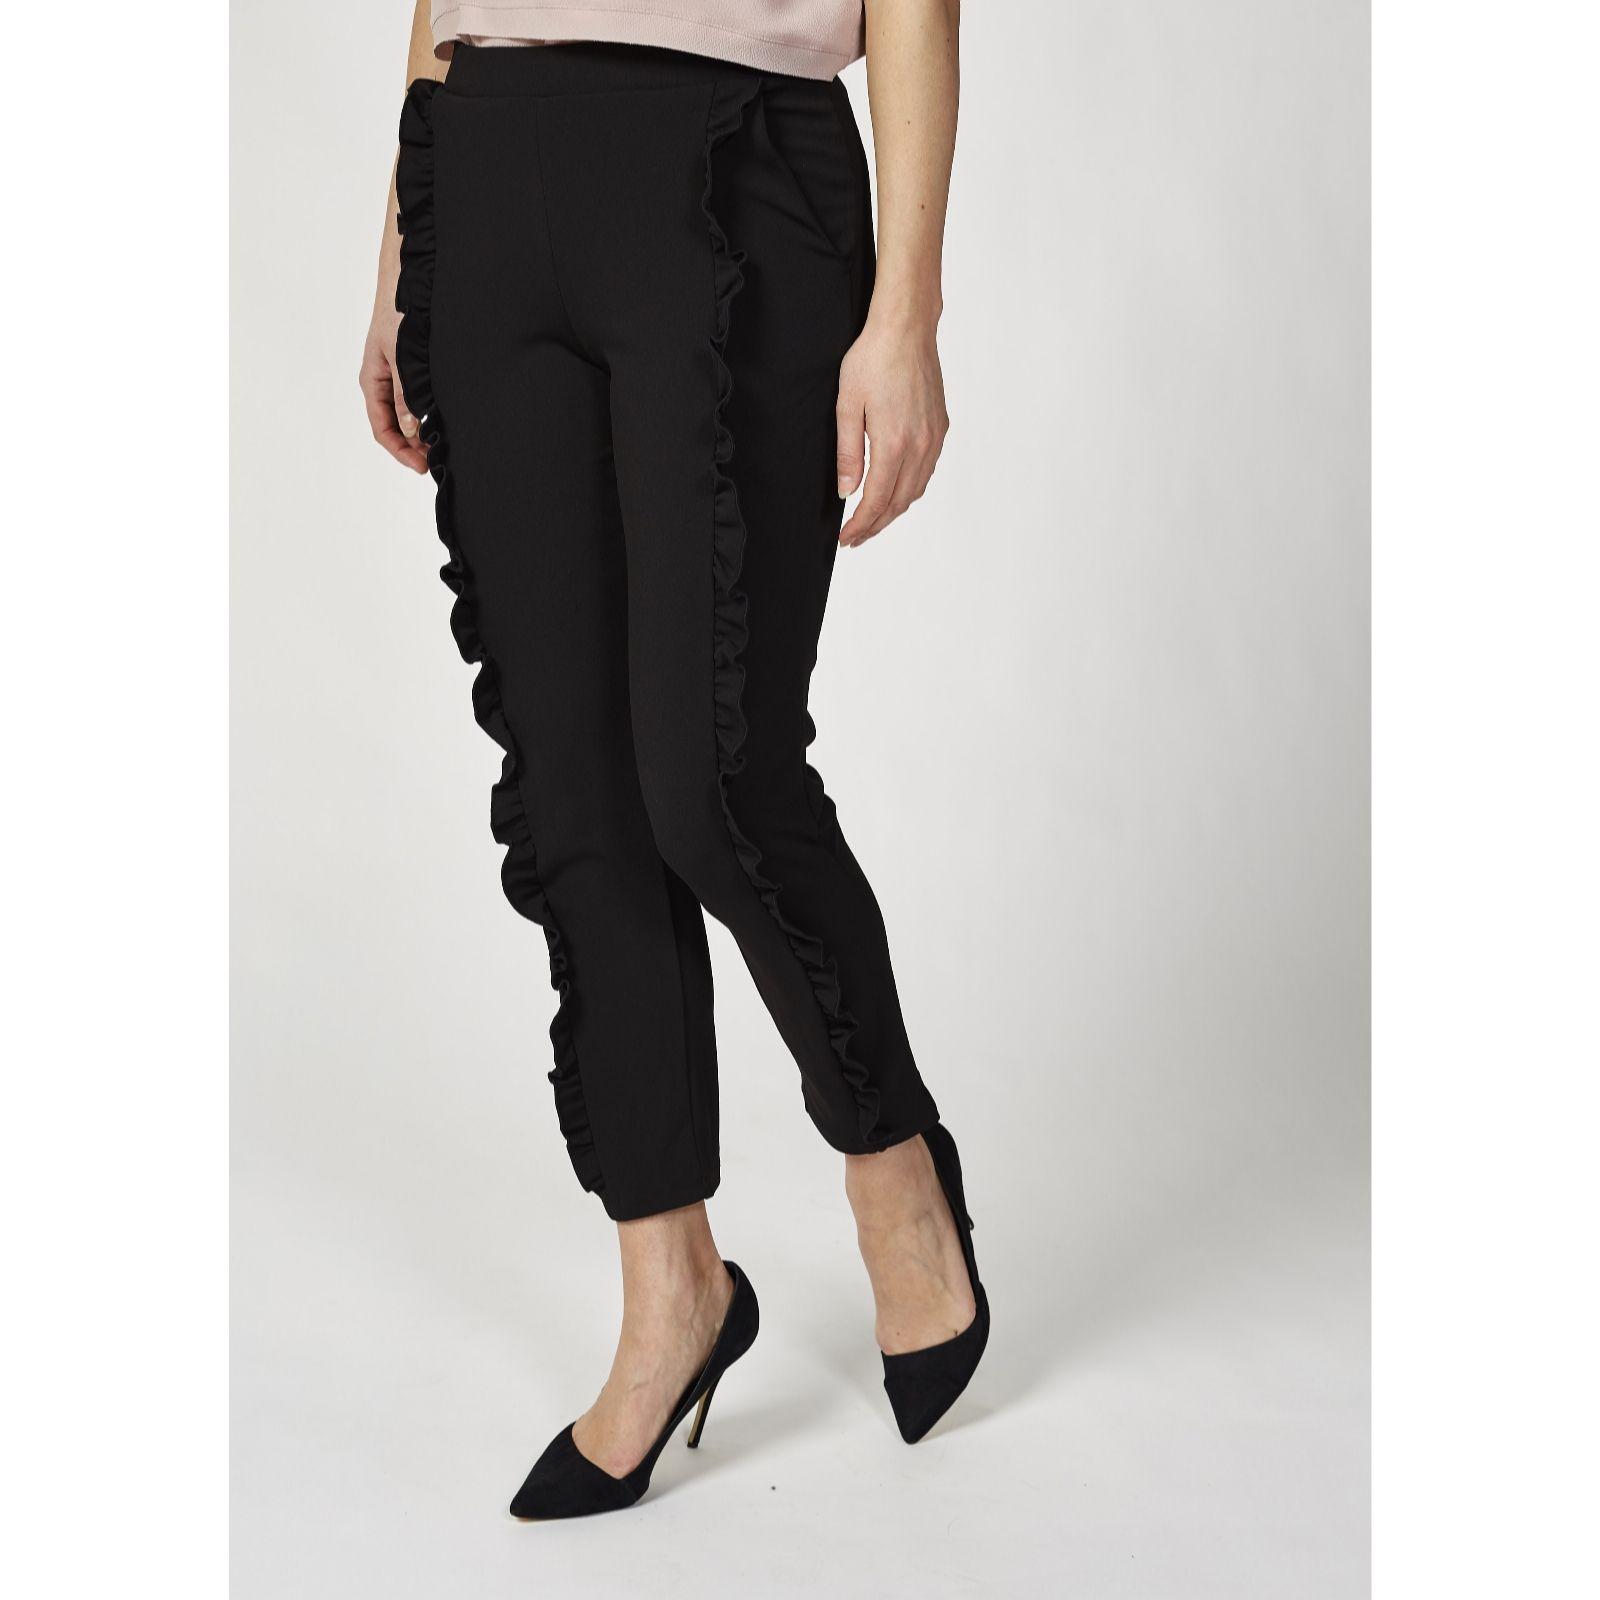 9dab467e4ad Skinny Leg Crepe Trousers with Ruffle Detail by Nina Leonard - QVC UK